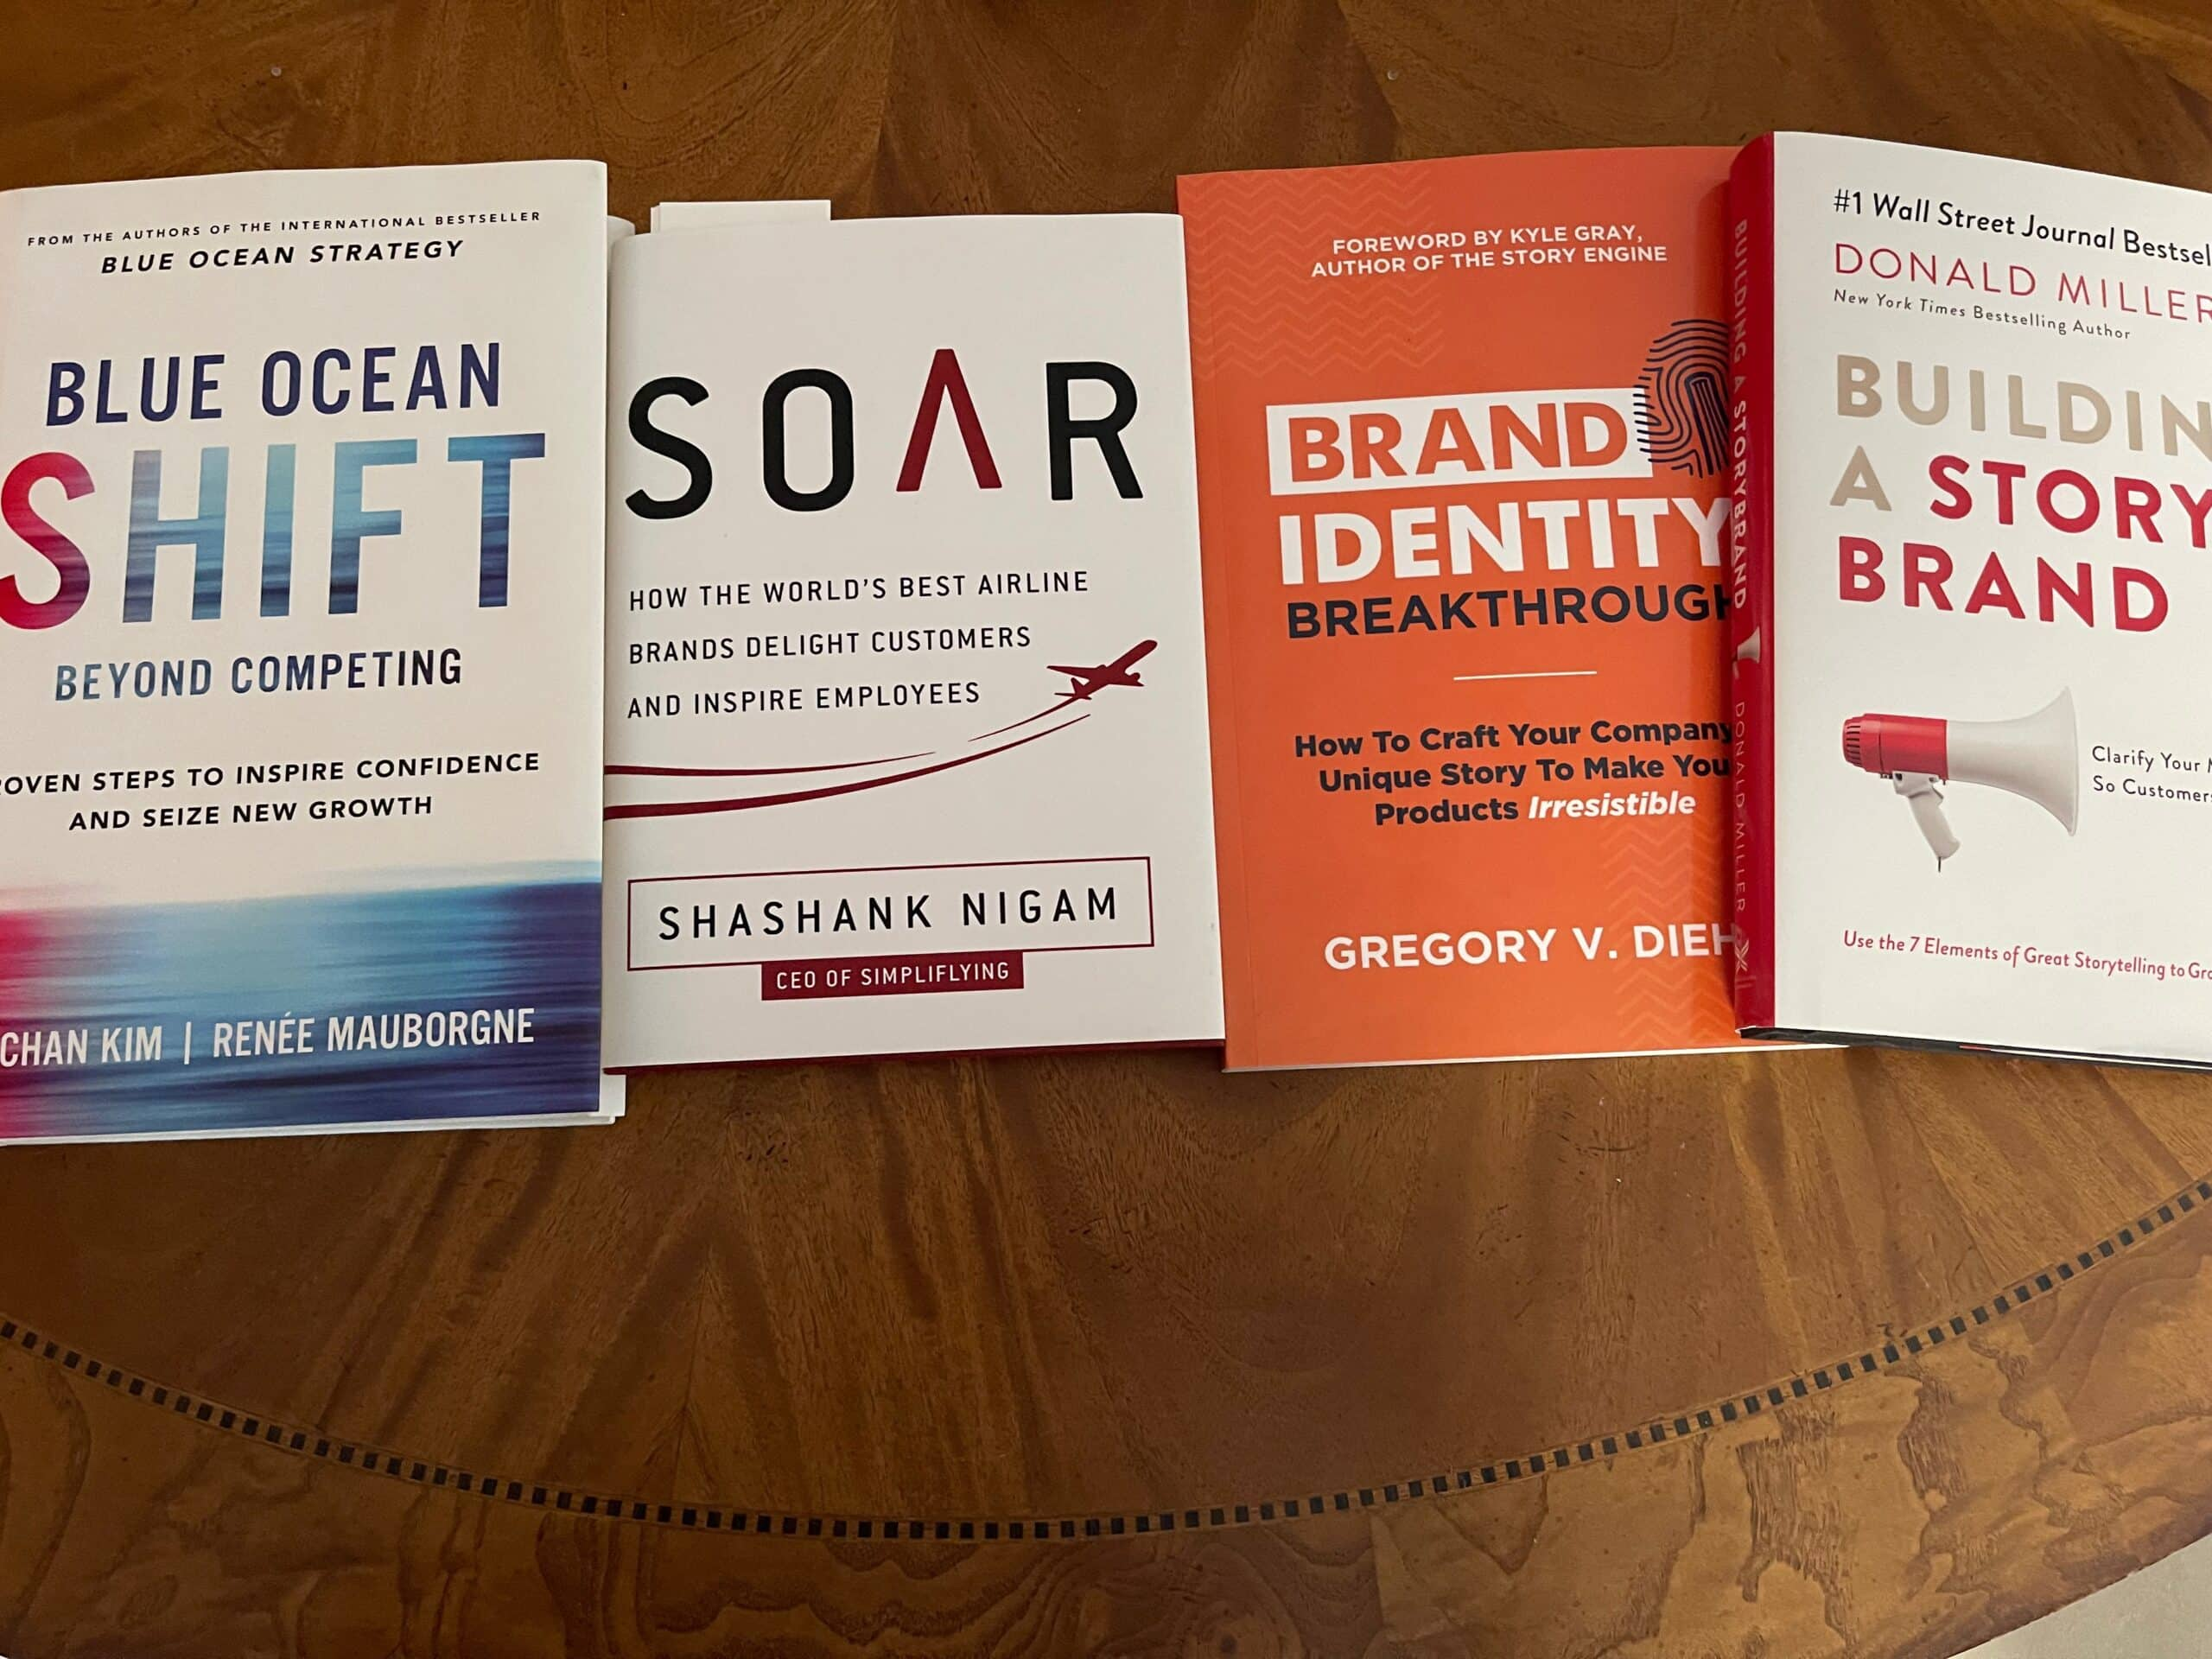 Books helpful for branding